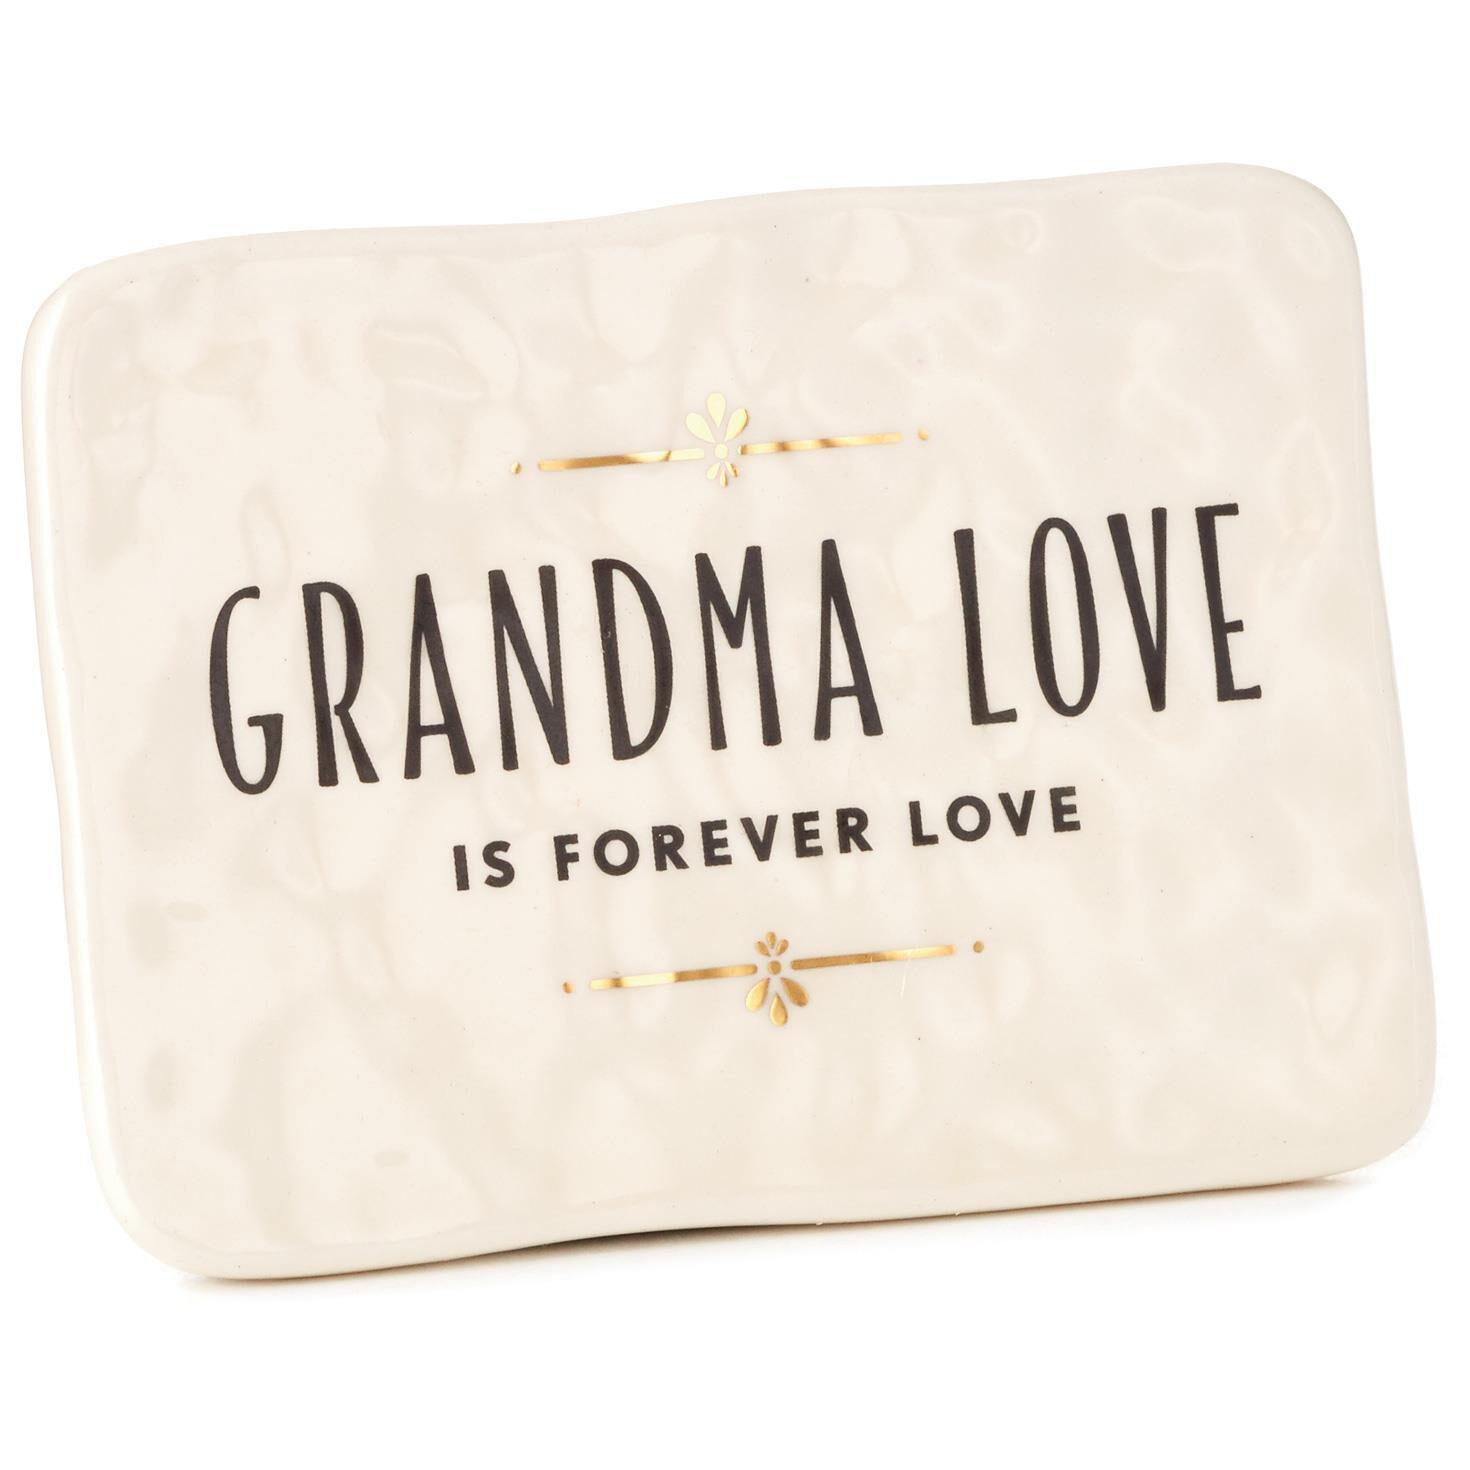 Grandma Love Quotes Grandma Love Ceramic Quote Block, 4x3   Plaques & Signs   Hallmark Grandma Love Quotes